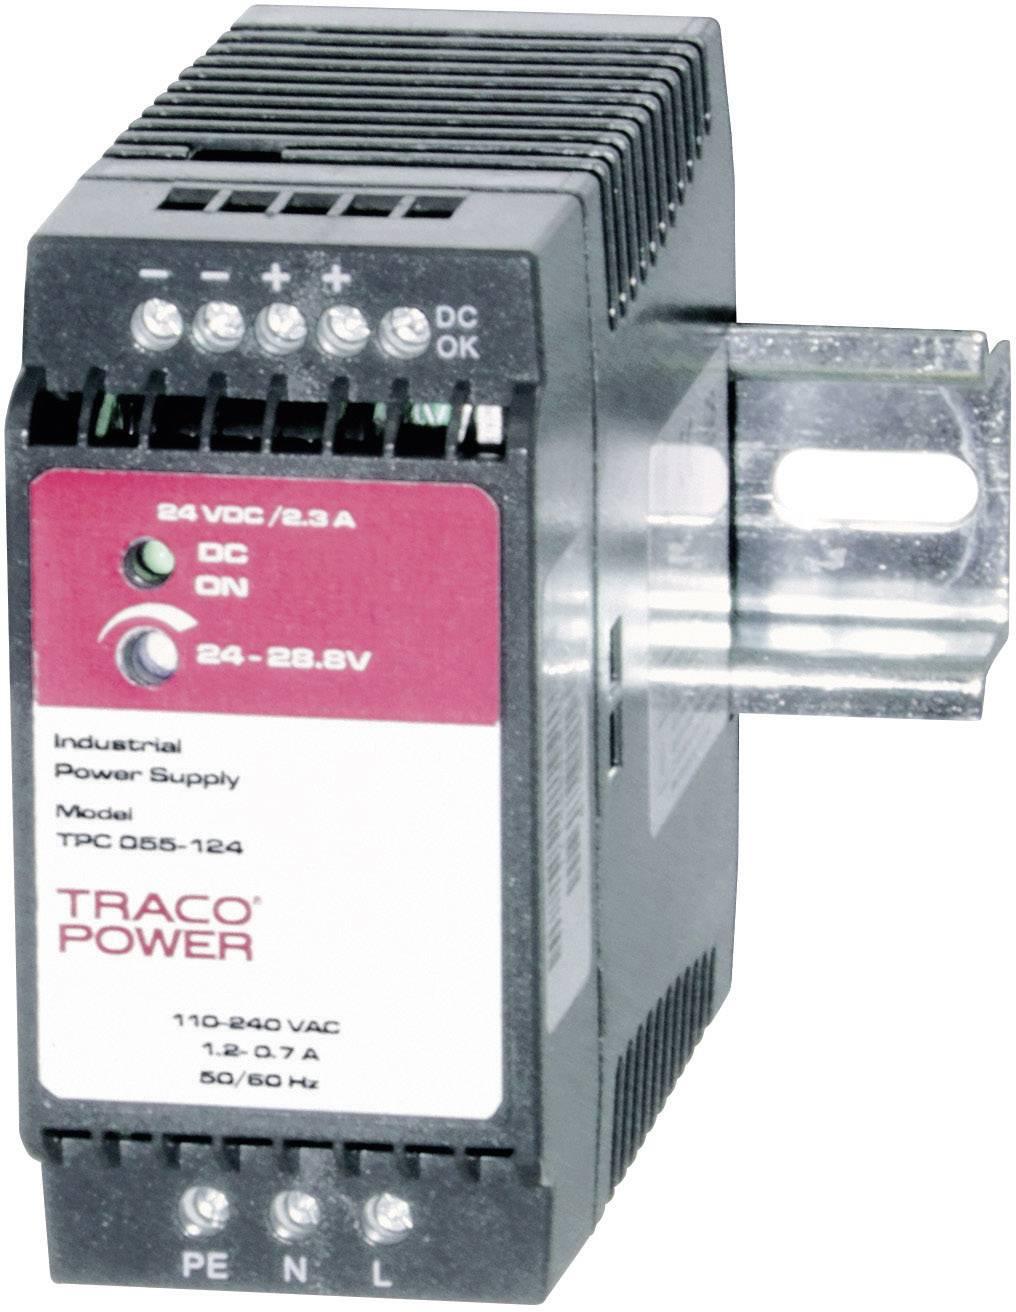 Zdroj na DIN lištu TracoPower TPC 055-148, 48 - 56 V/DC, 1,15 A